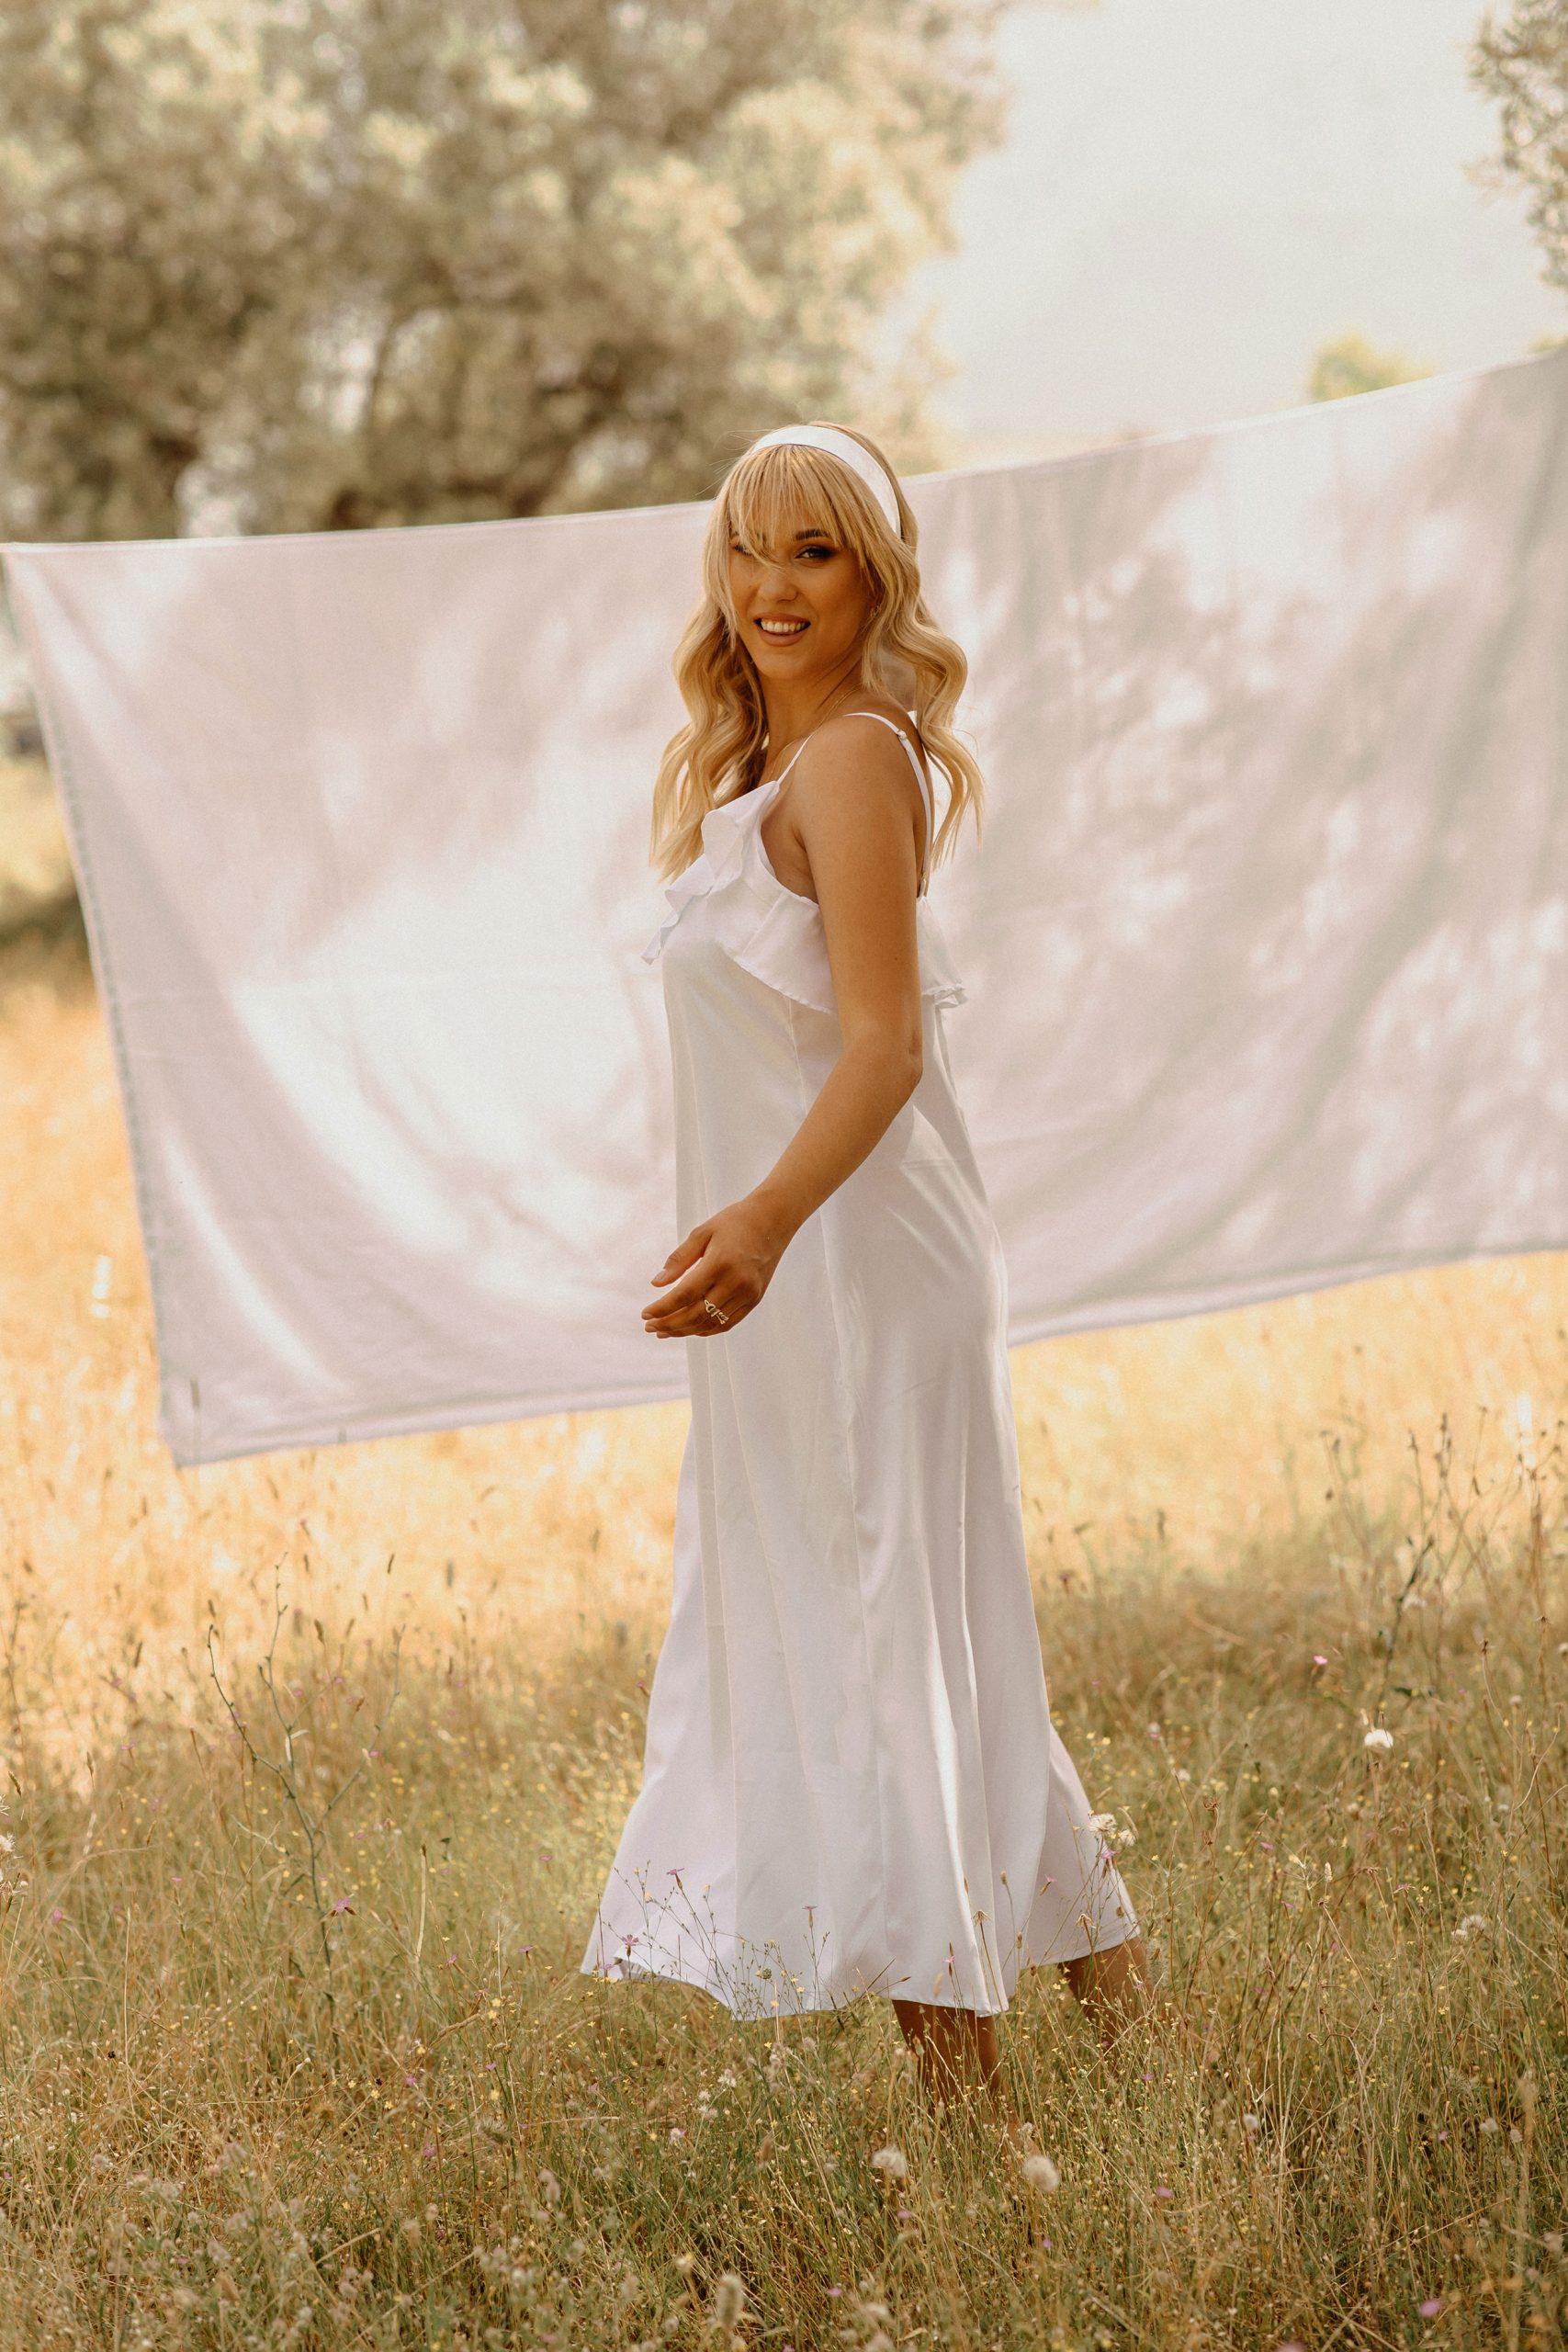 Pretty blonde posing in a clothesline in a Wheatfield